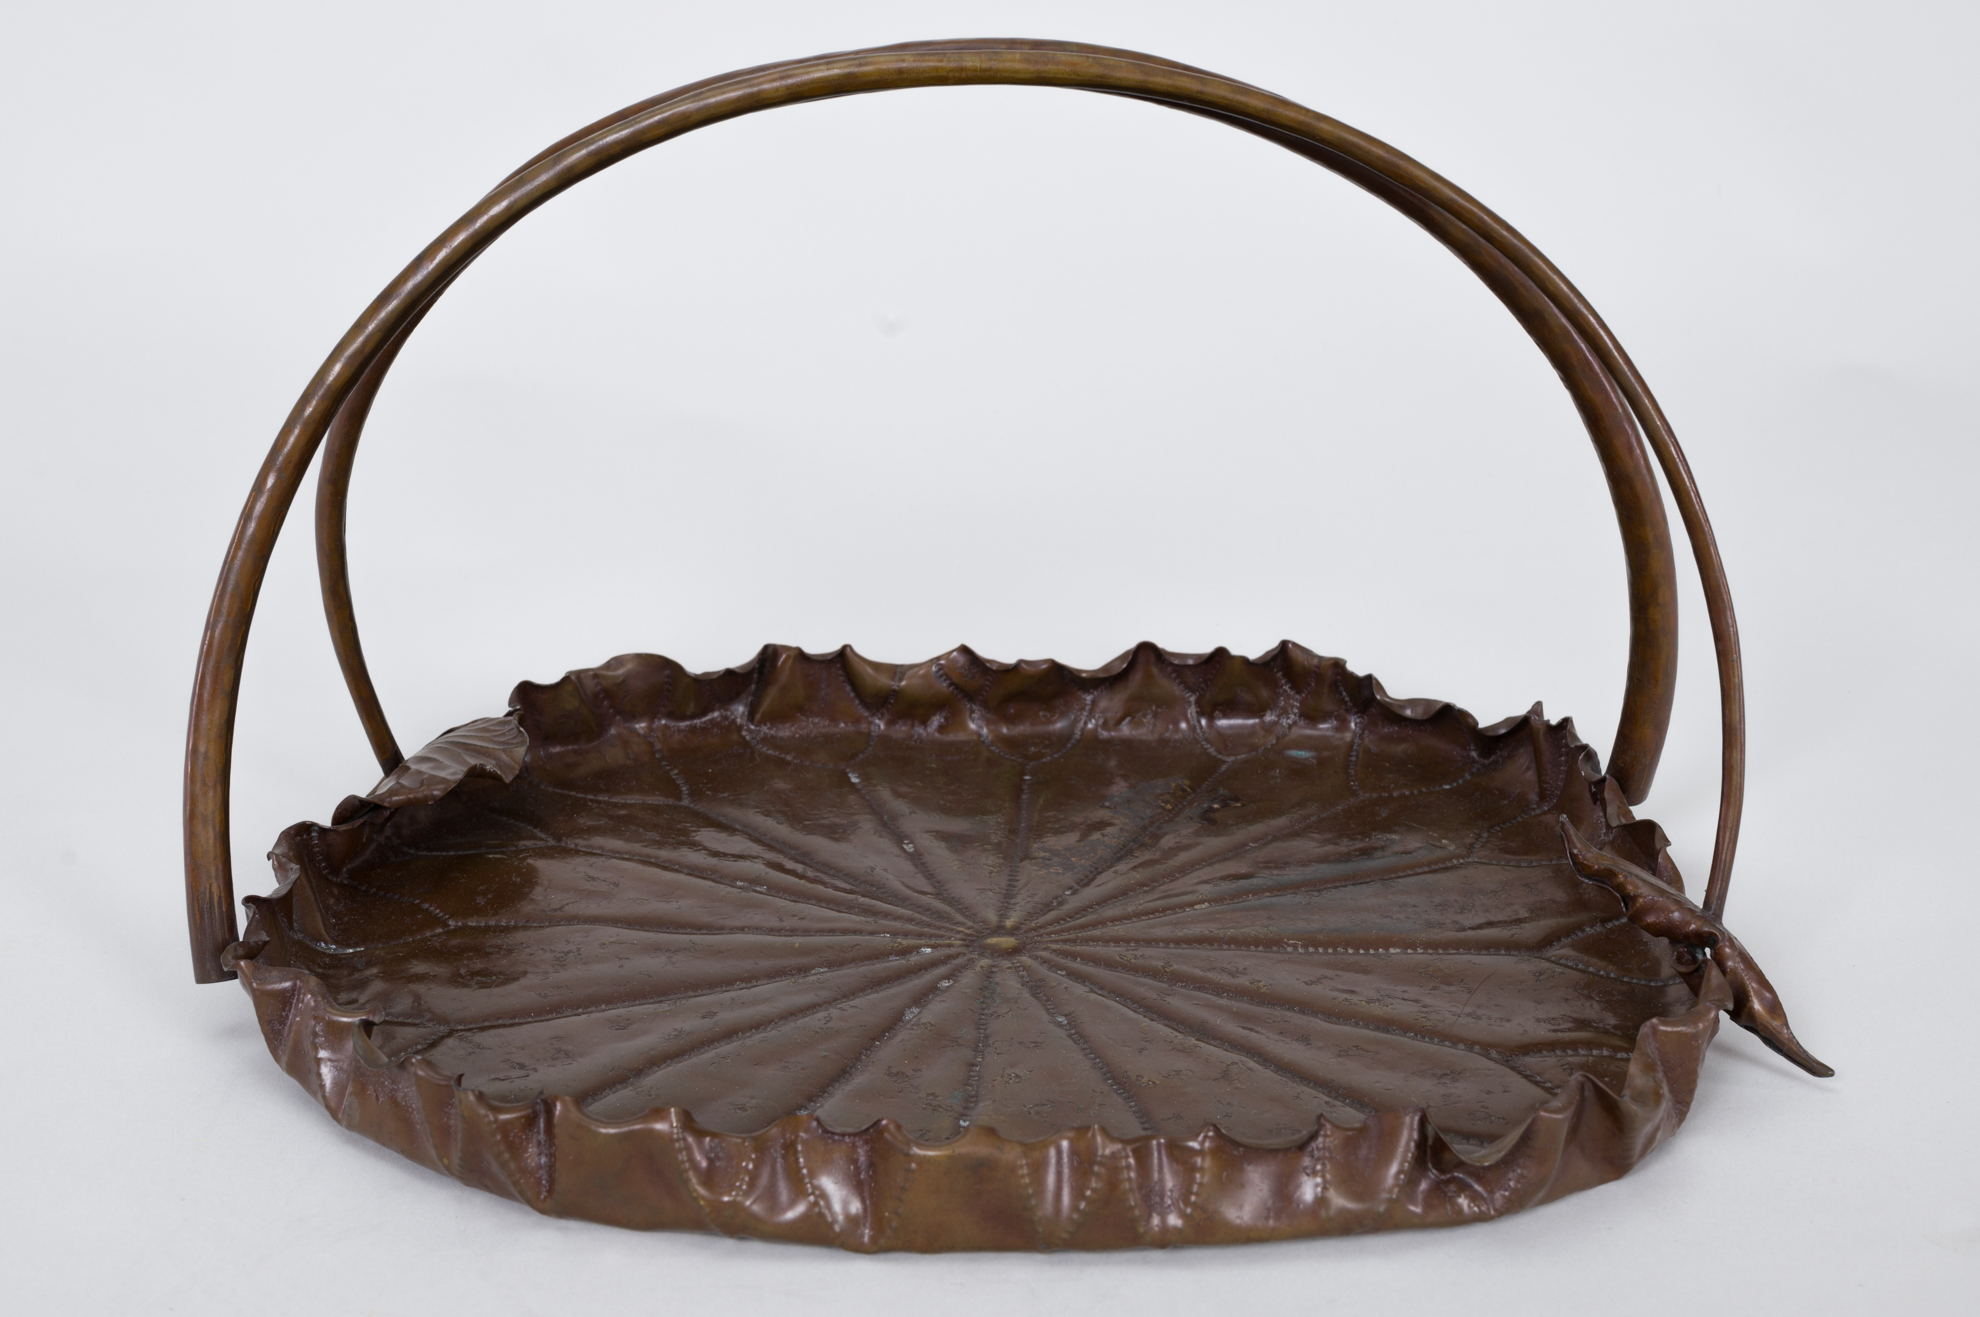 Japanese art, Japanese antique, Japanese bronze, Japanese tray, metal tray